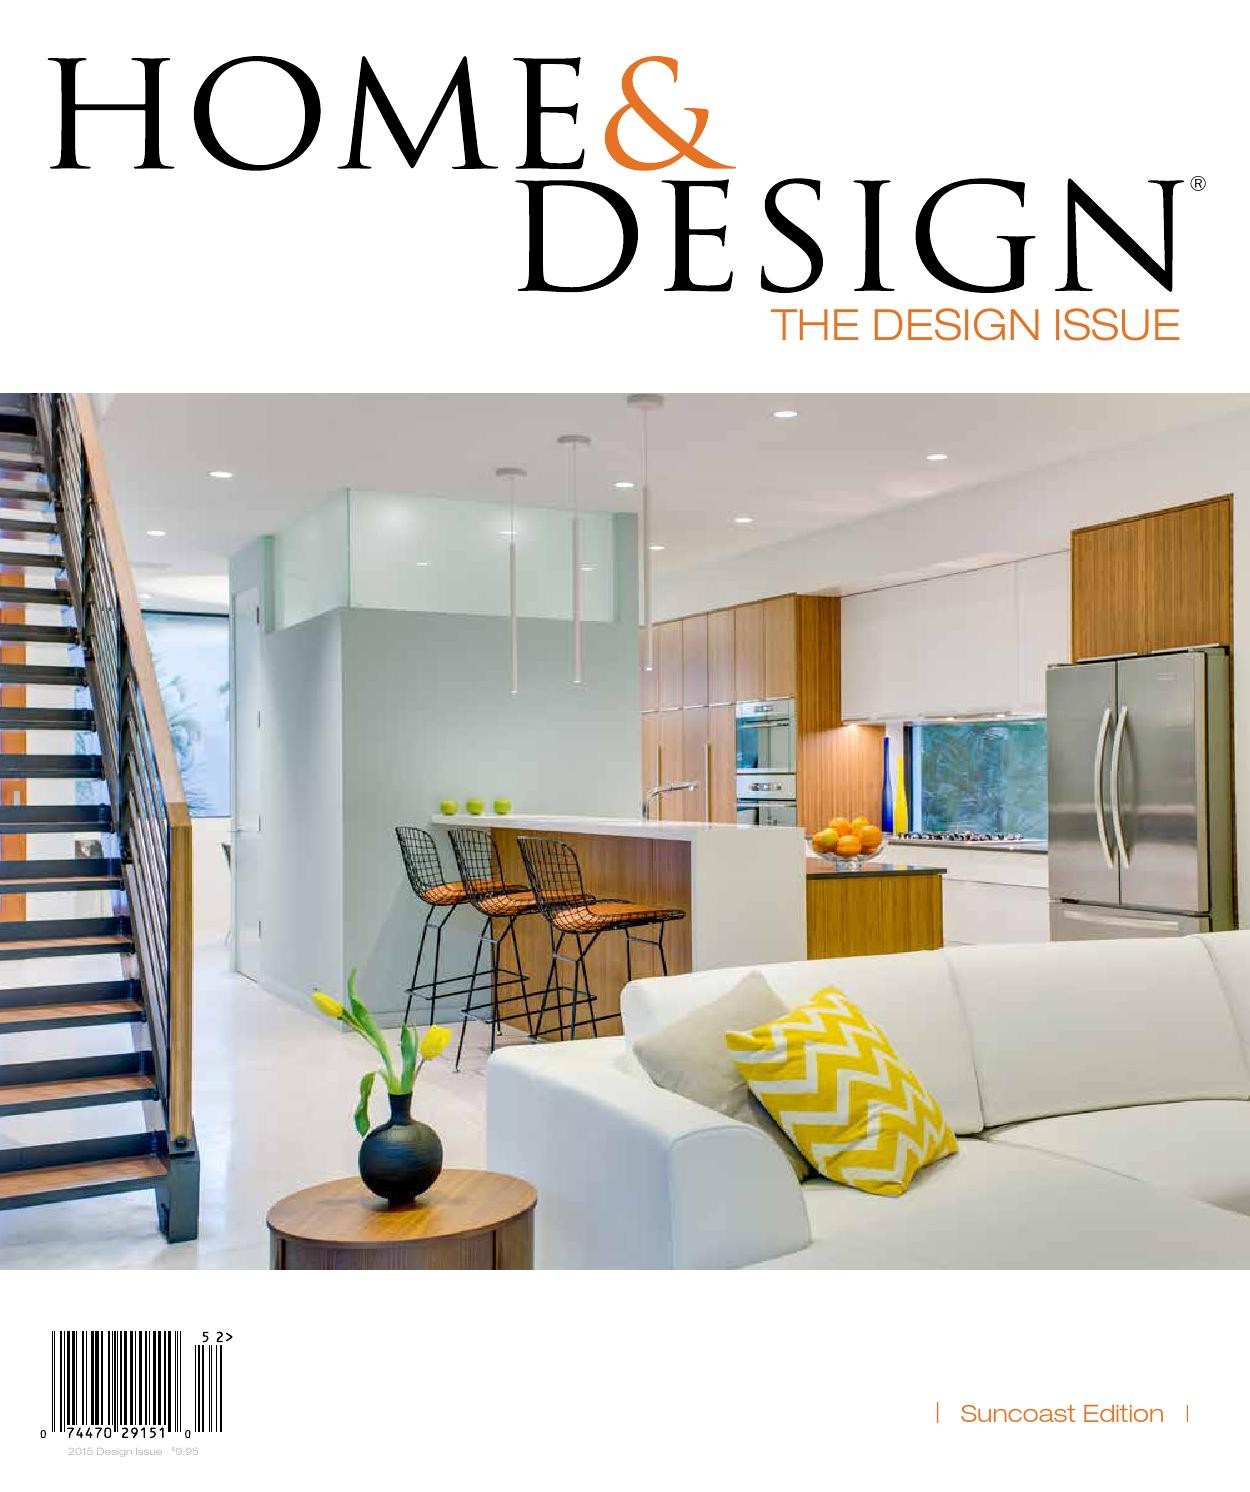 Home & Design Magazine Design Issue 2015 Suncoast Florida